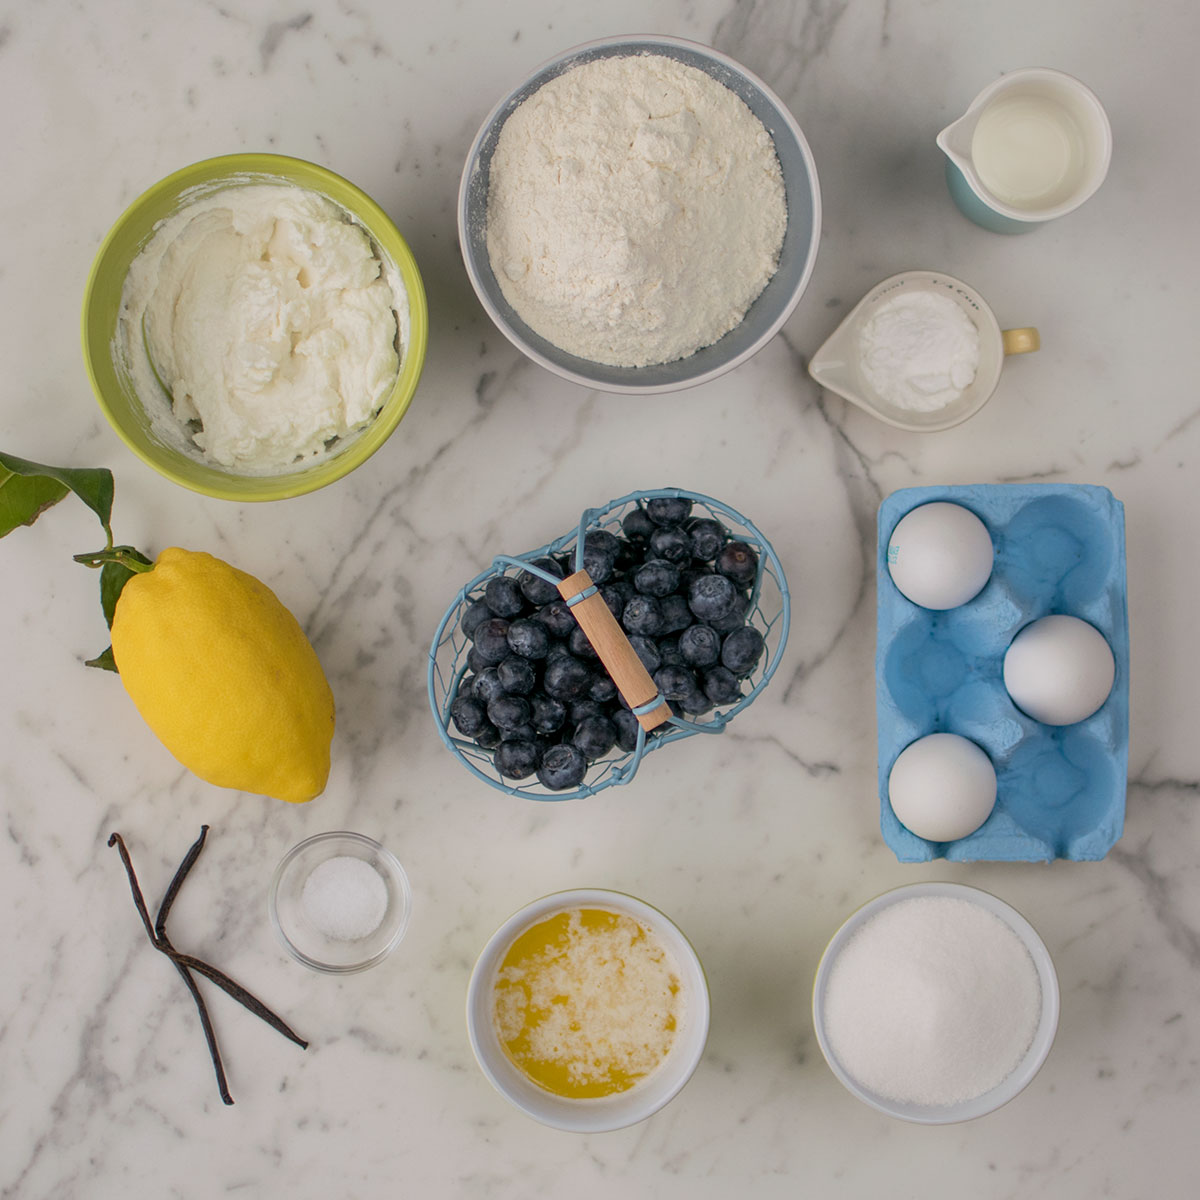 bundt_cake_ricotta_mirtilli_limone_ingredienti